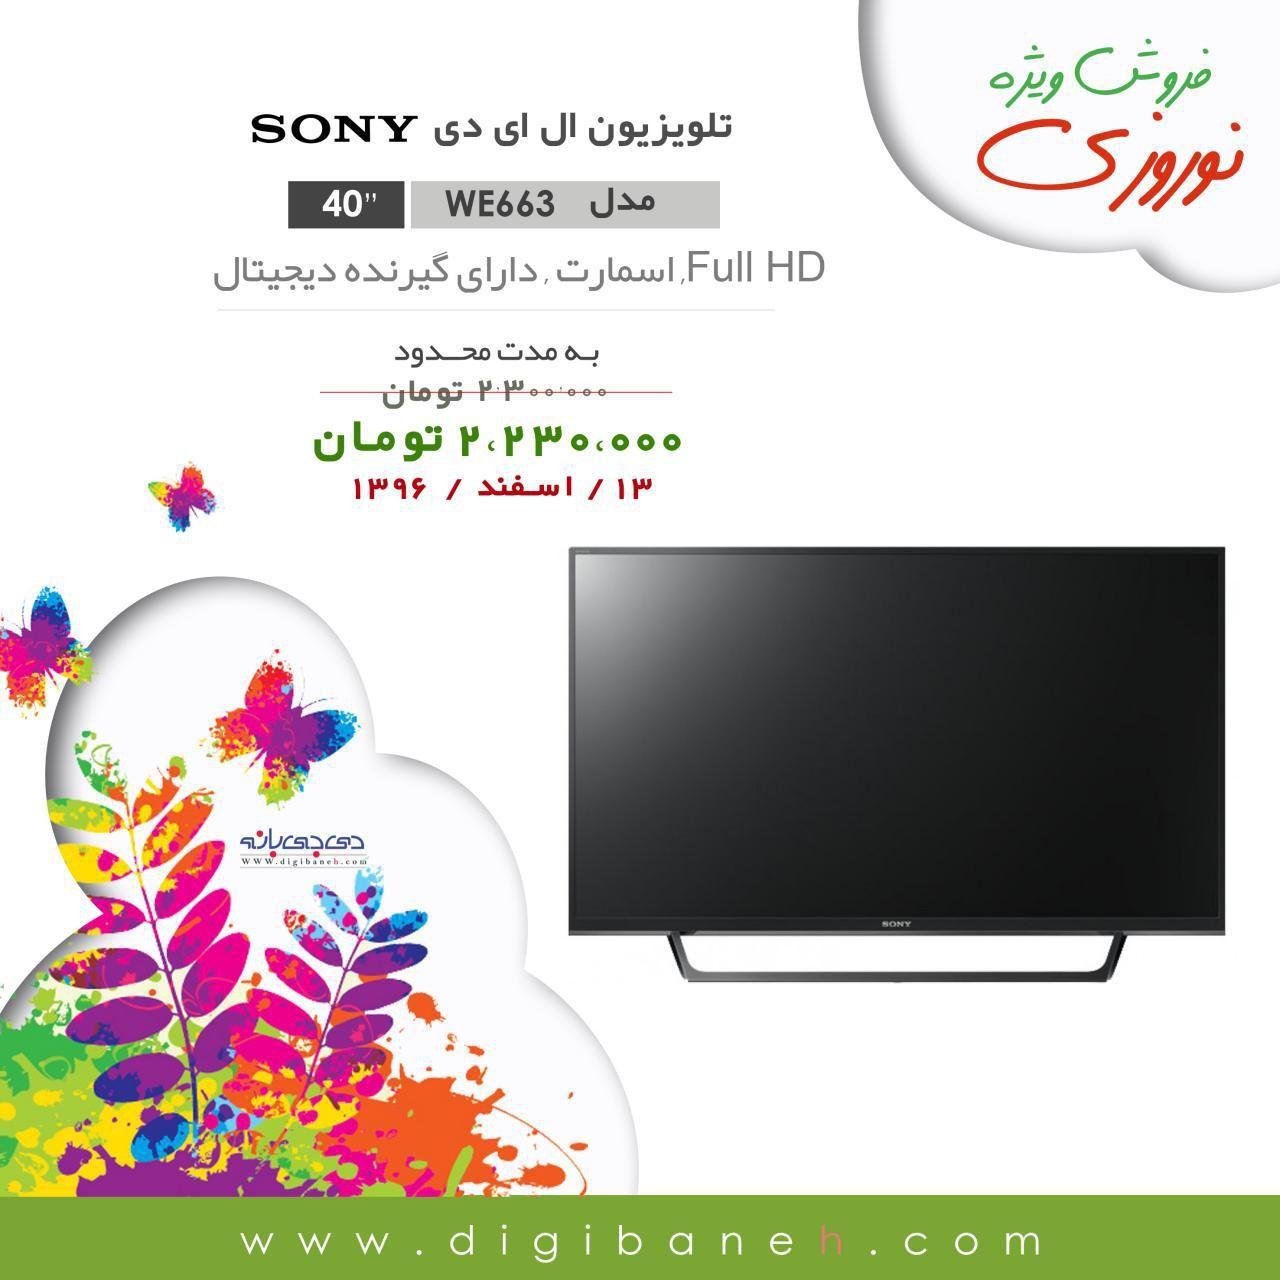 قیمت و خرید تلویزیون سونی We663 سونی 40we663